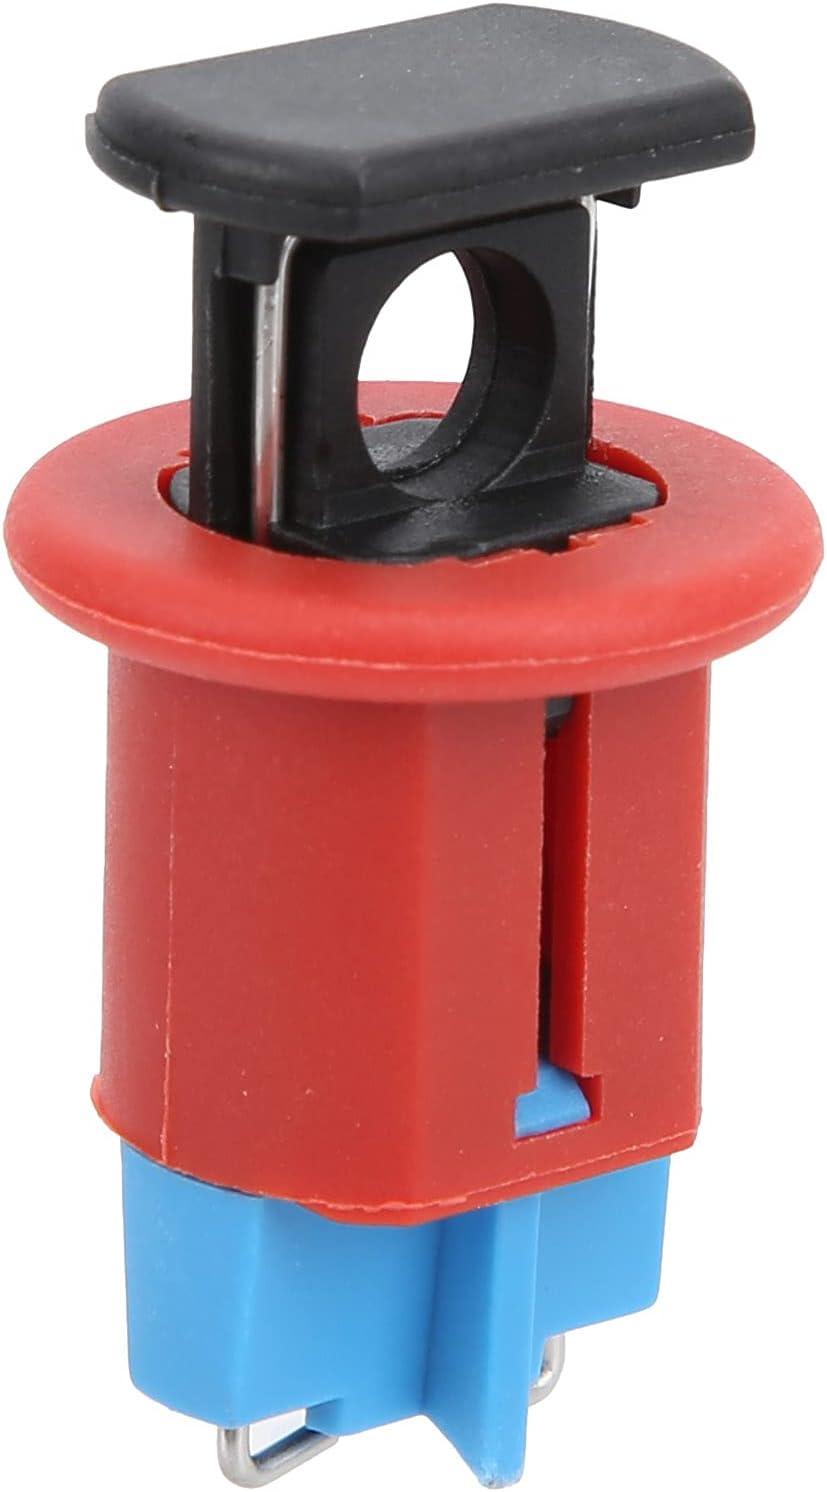 01 Minicerradura para disyuntor, Dispositivo de Bloqueo de Circuito en Miniatura Suave con Hebilla Tipo botón para Industria eléctrica